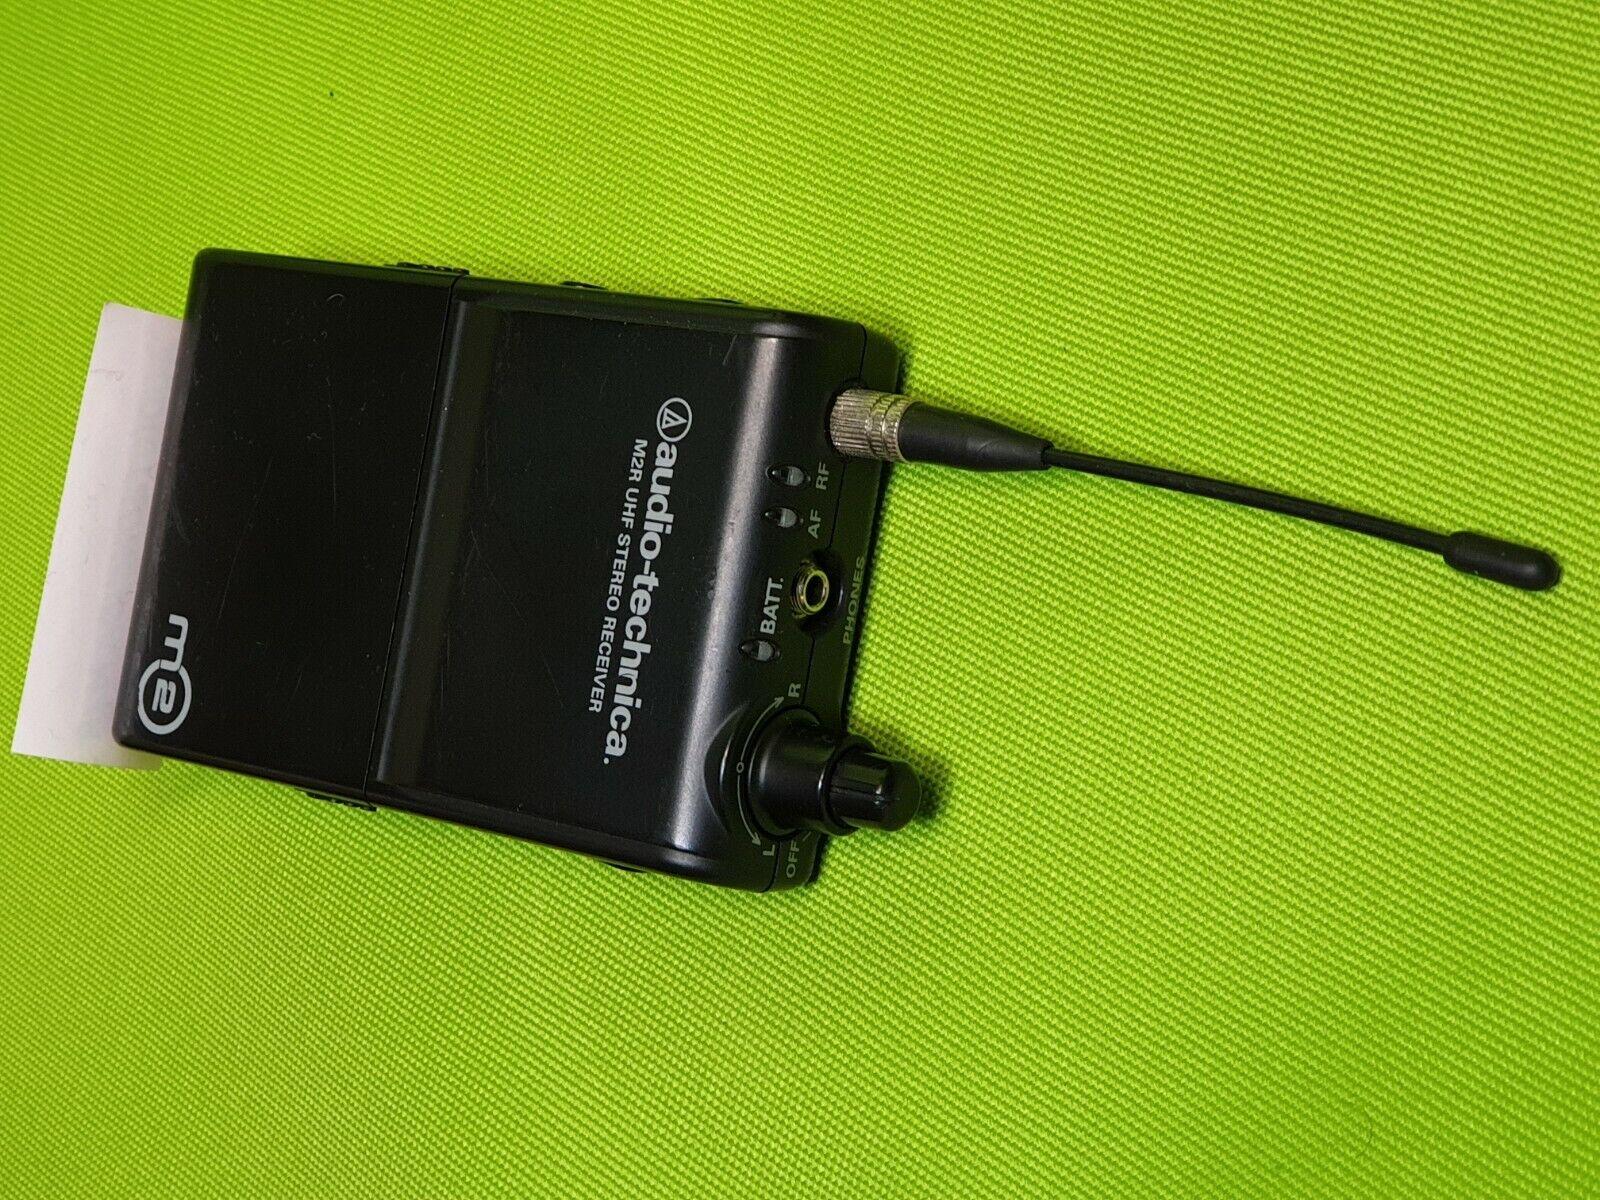 Audio-Technica M2R UHF Stereo Reciever 790822MHz  Wireless In-Ear Monitor